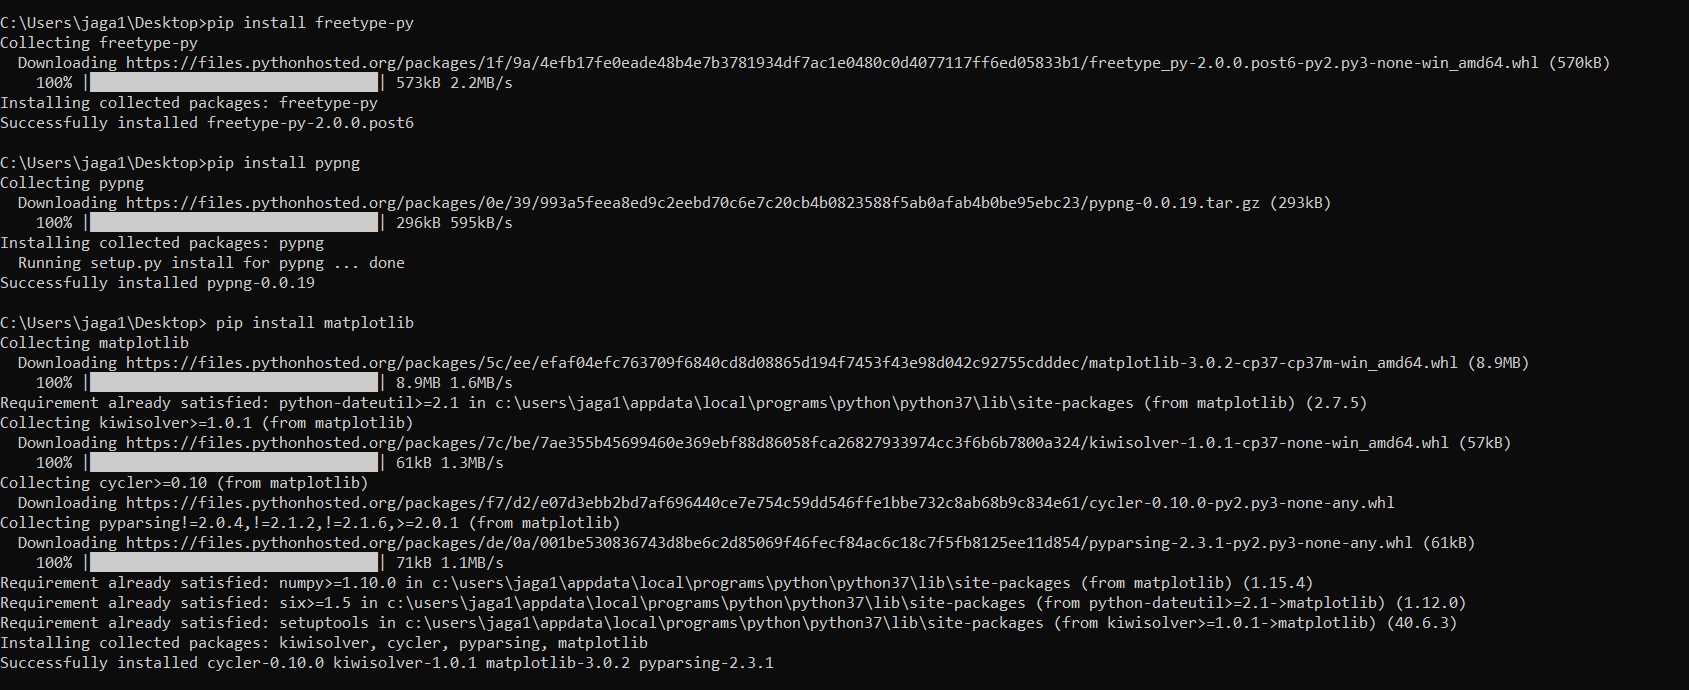 installation error: it says